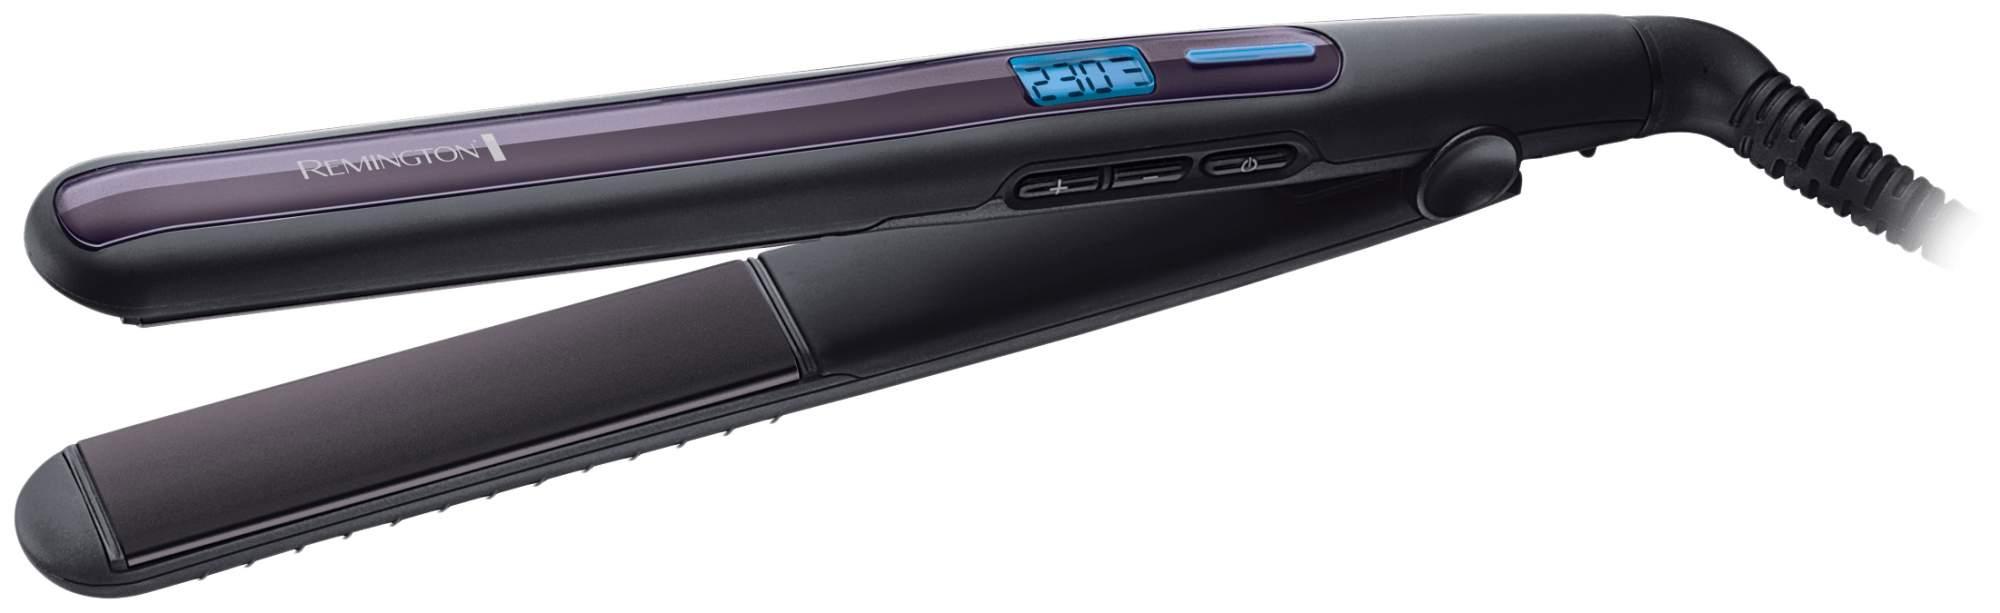 Стайлер Remington S6505